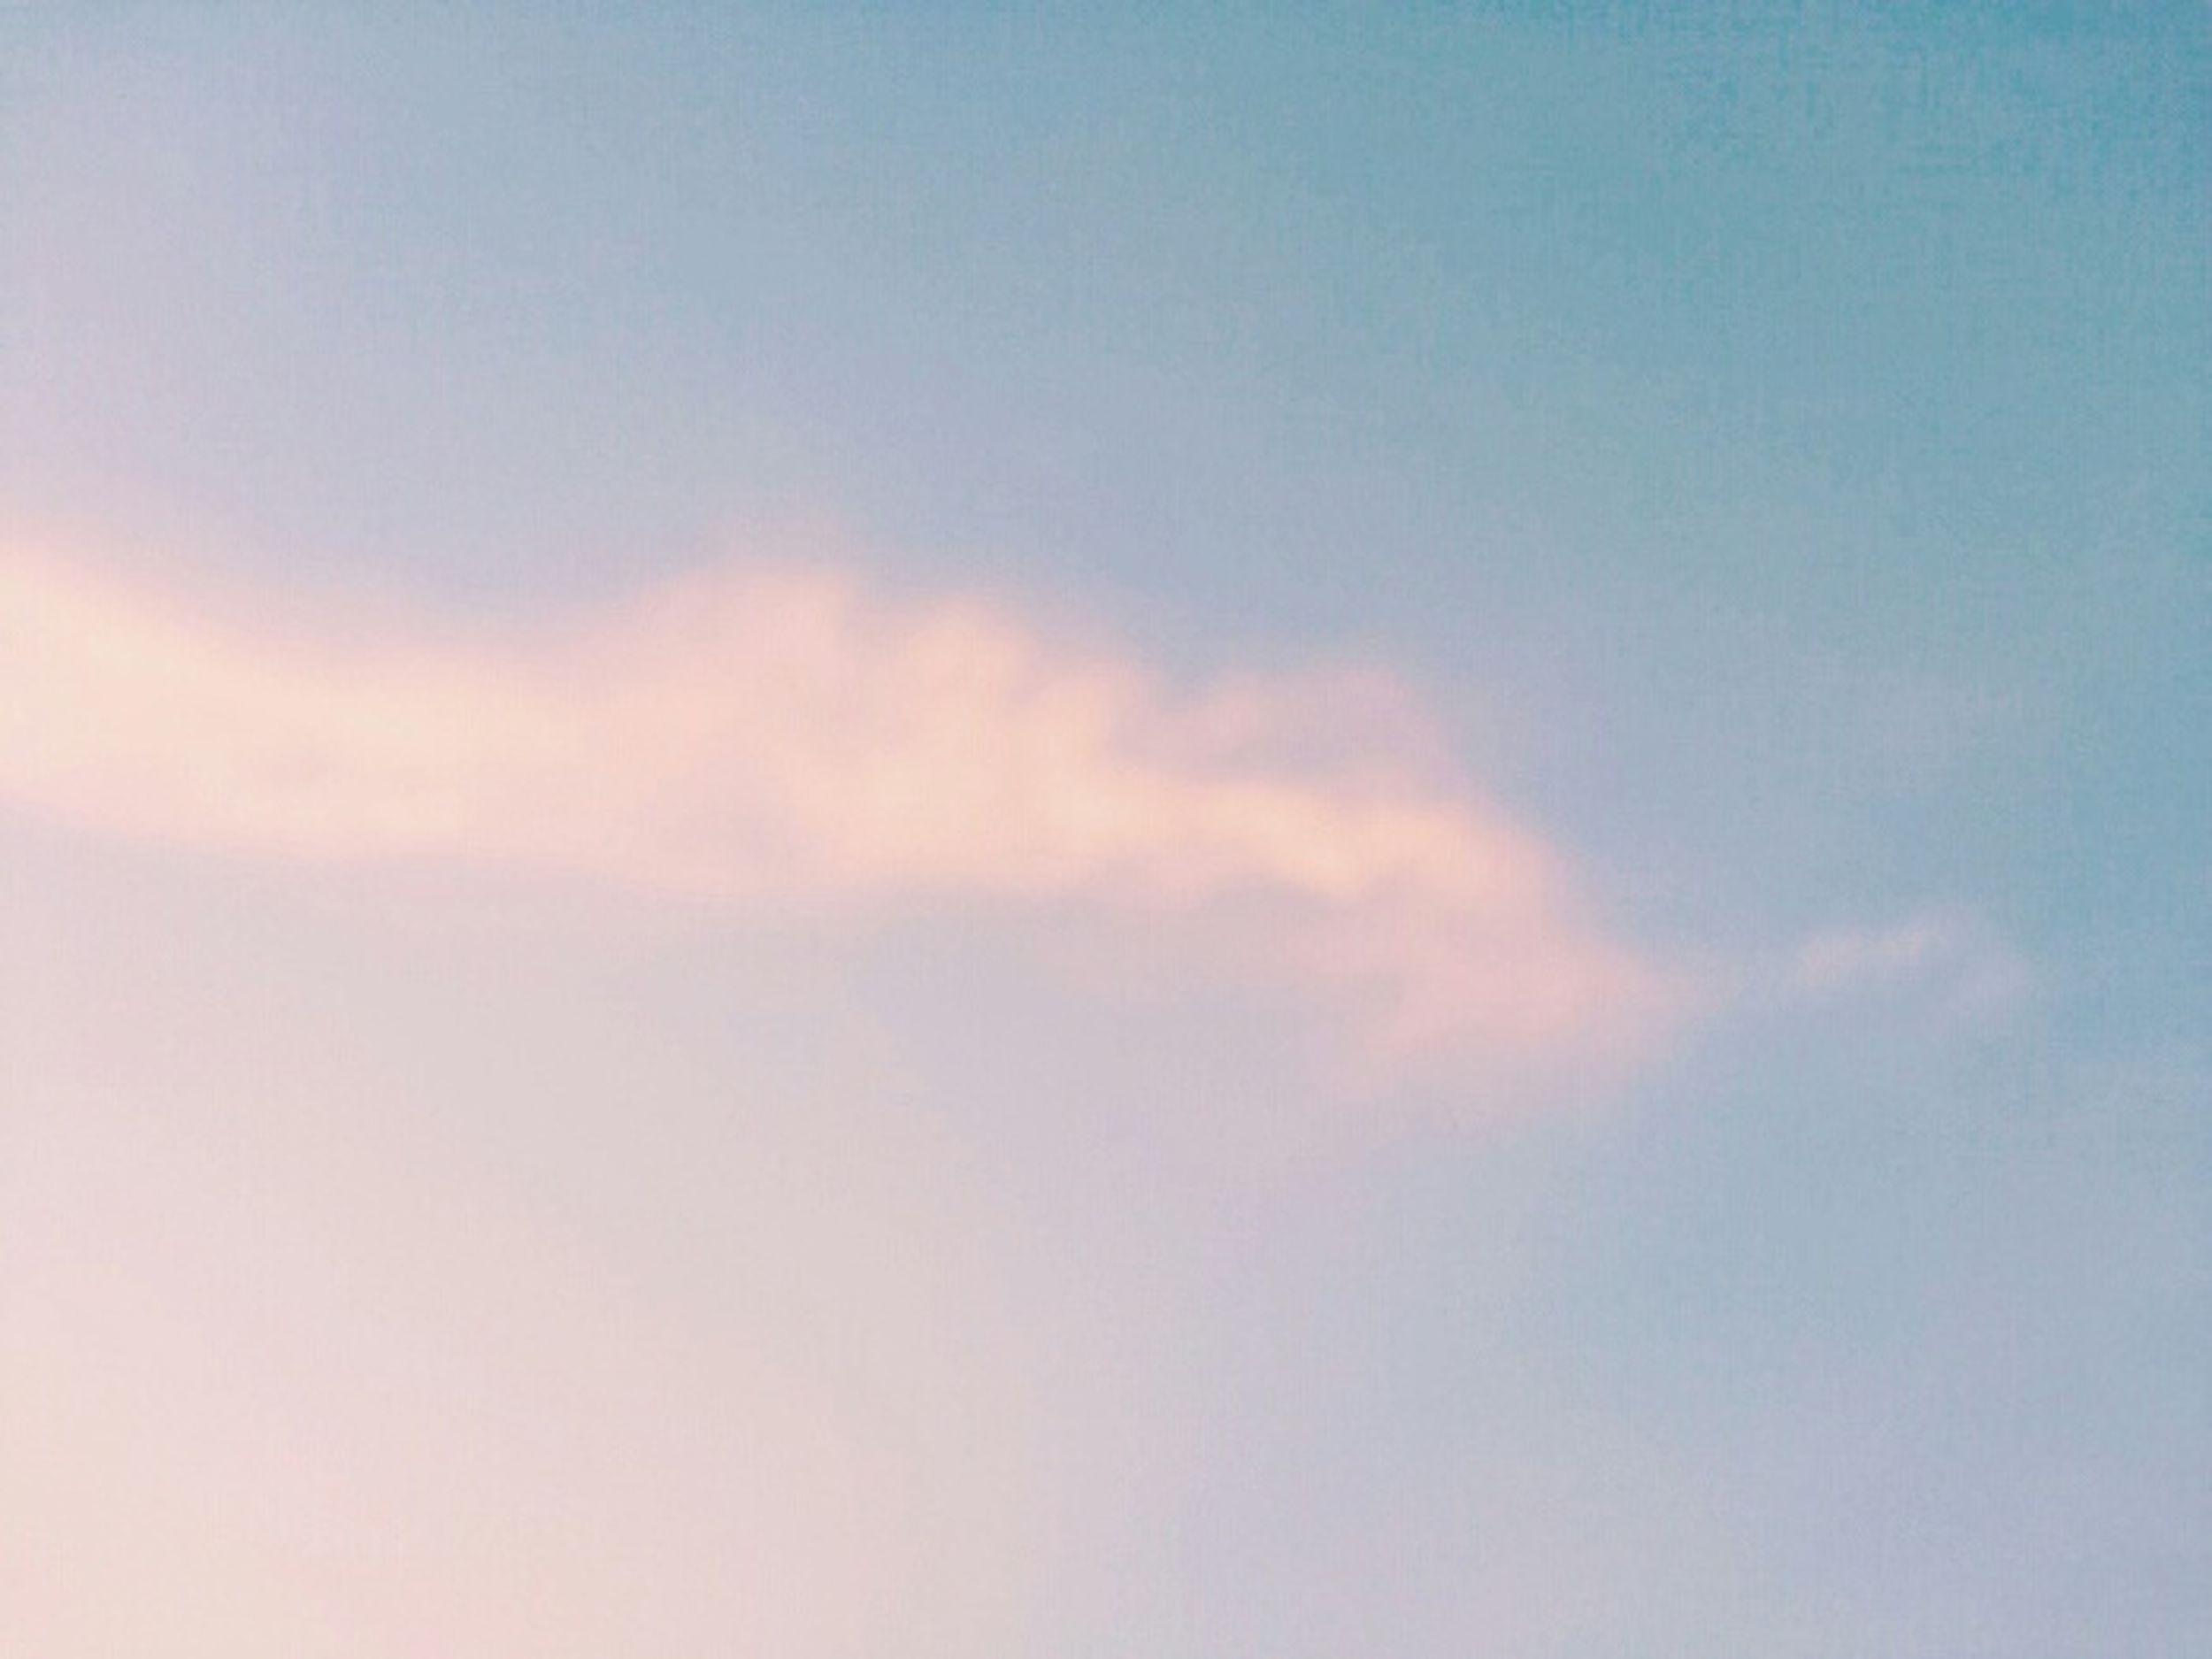 Blue Sky มองท้องฟ้า ไม่เป็นเช่นเคย